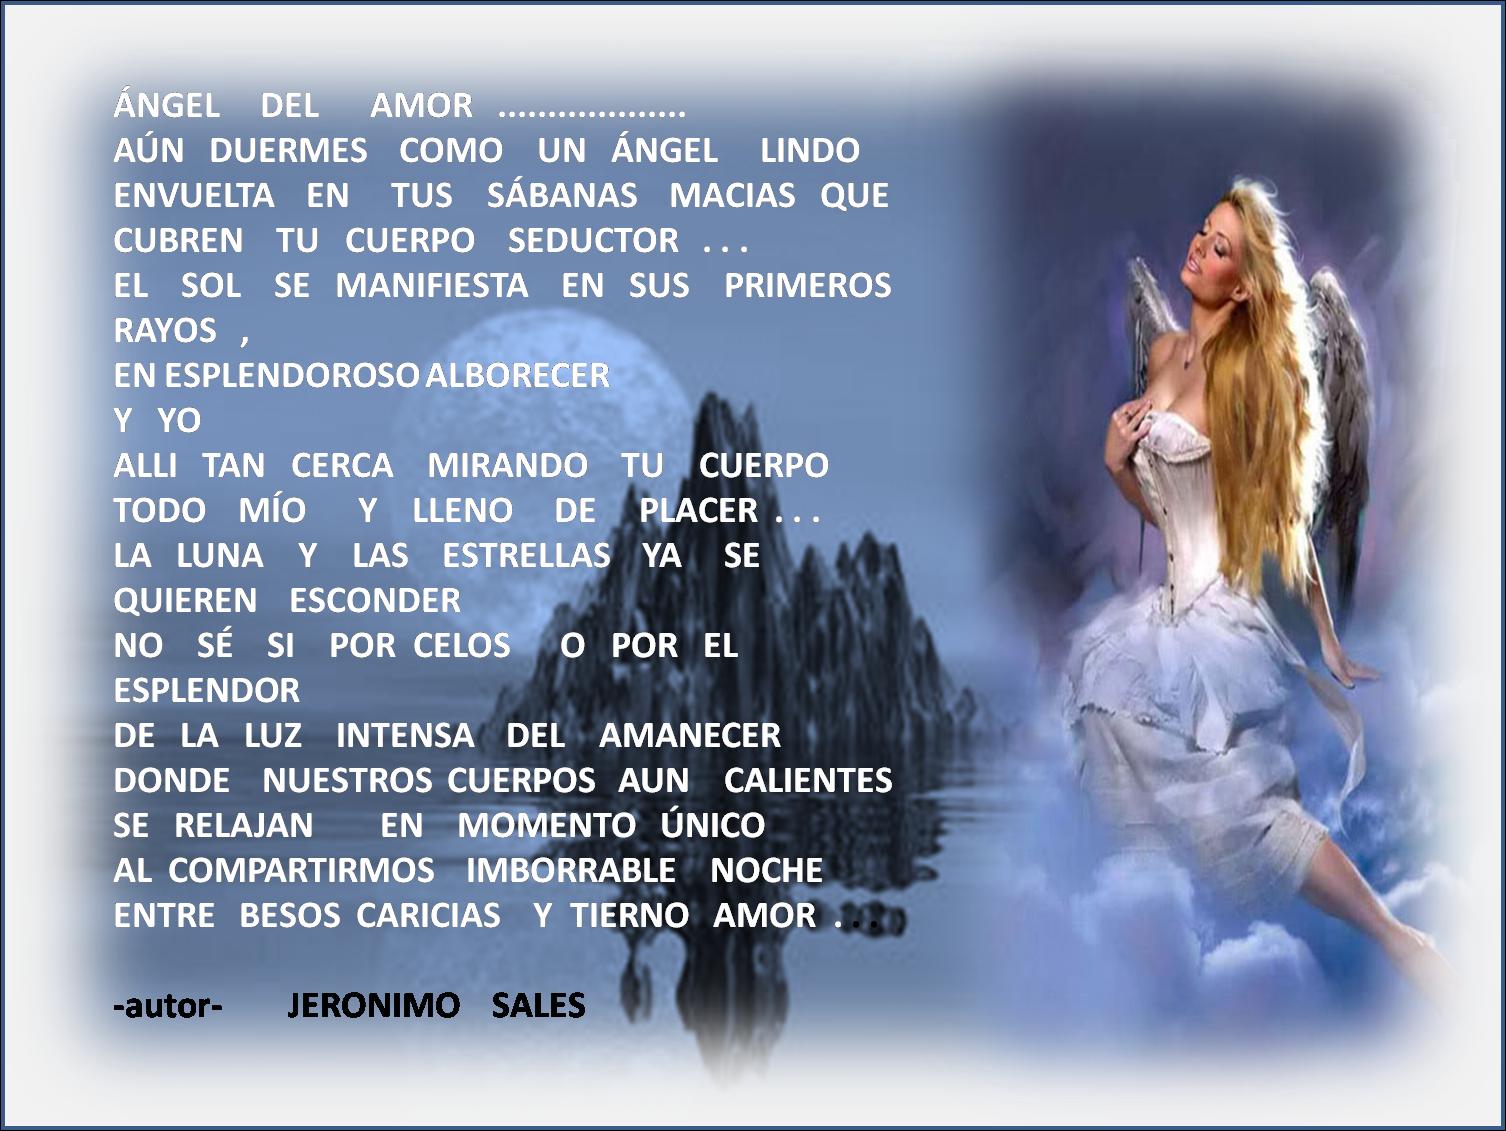 http://1.bp.blogspot.com/-pd6P4cBL4Eo/TexOKJF7-iI/AAAAAAAAAnU/fh69RY2iQdM/s1600/angel%20de%20amor%20-2-jeronimo%20sales.png